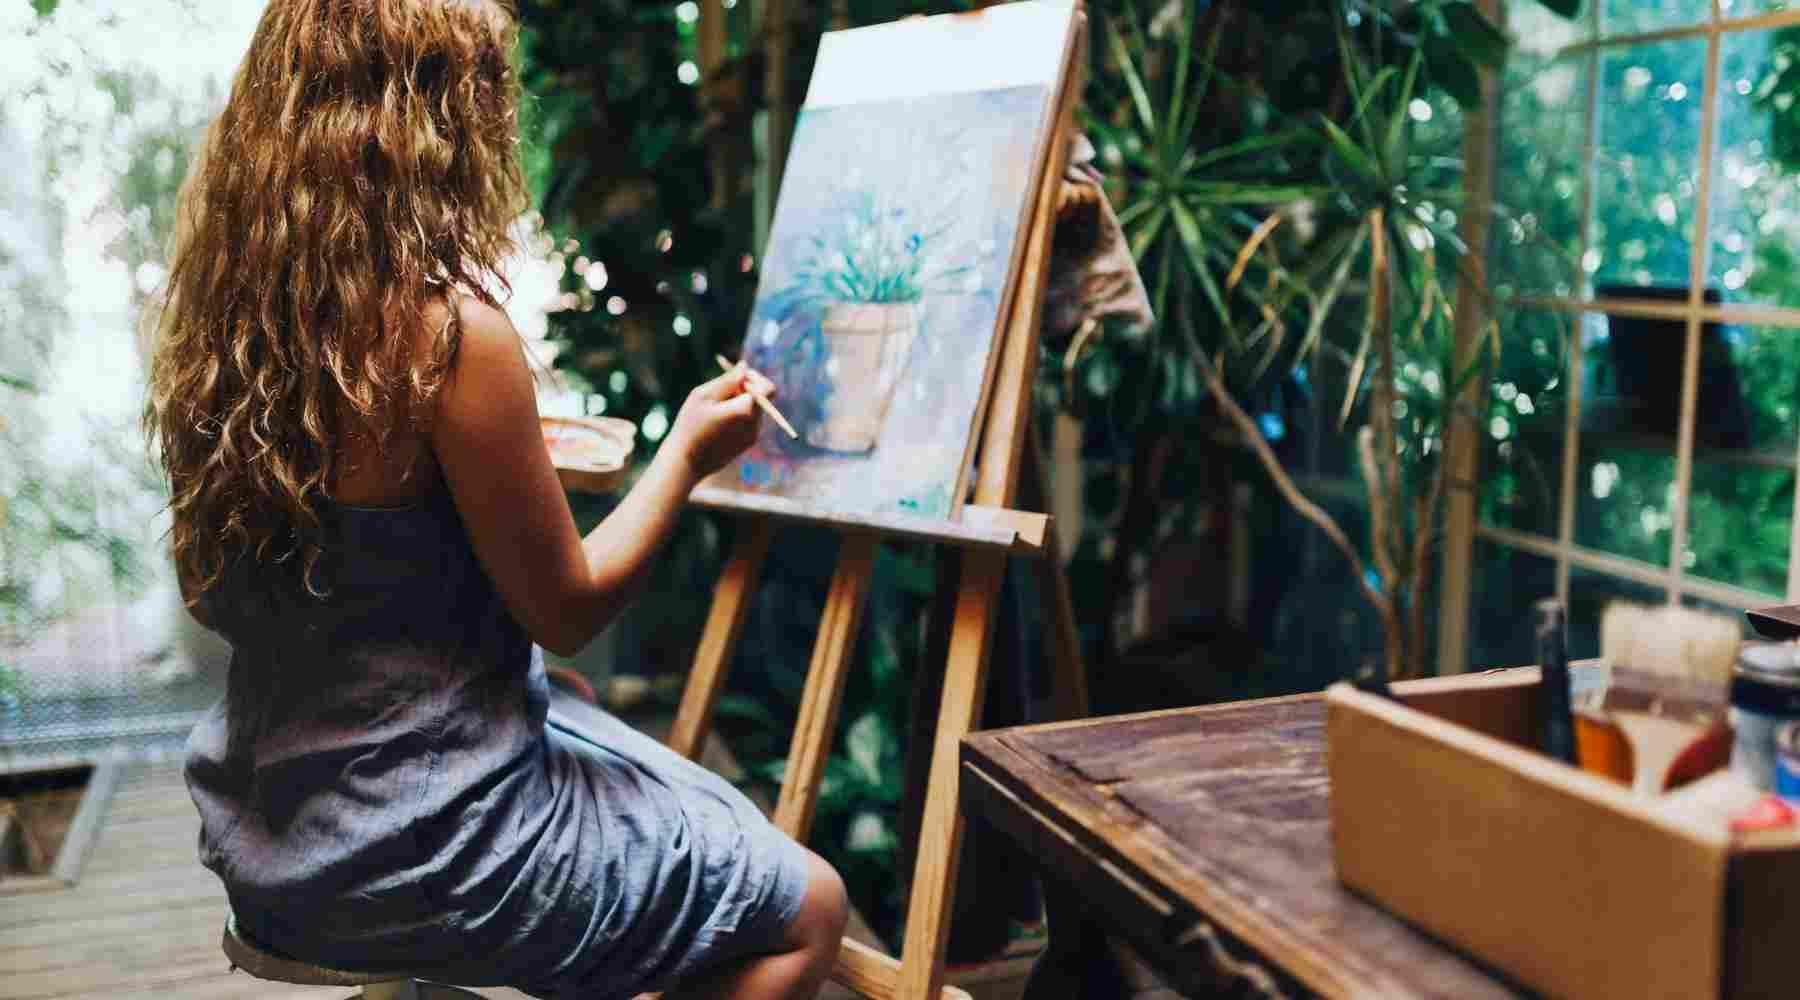 Hobbies that Make Money - Painting